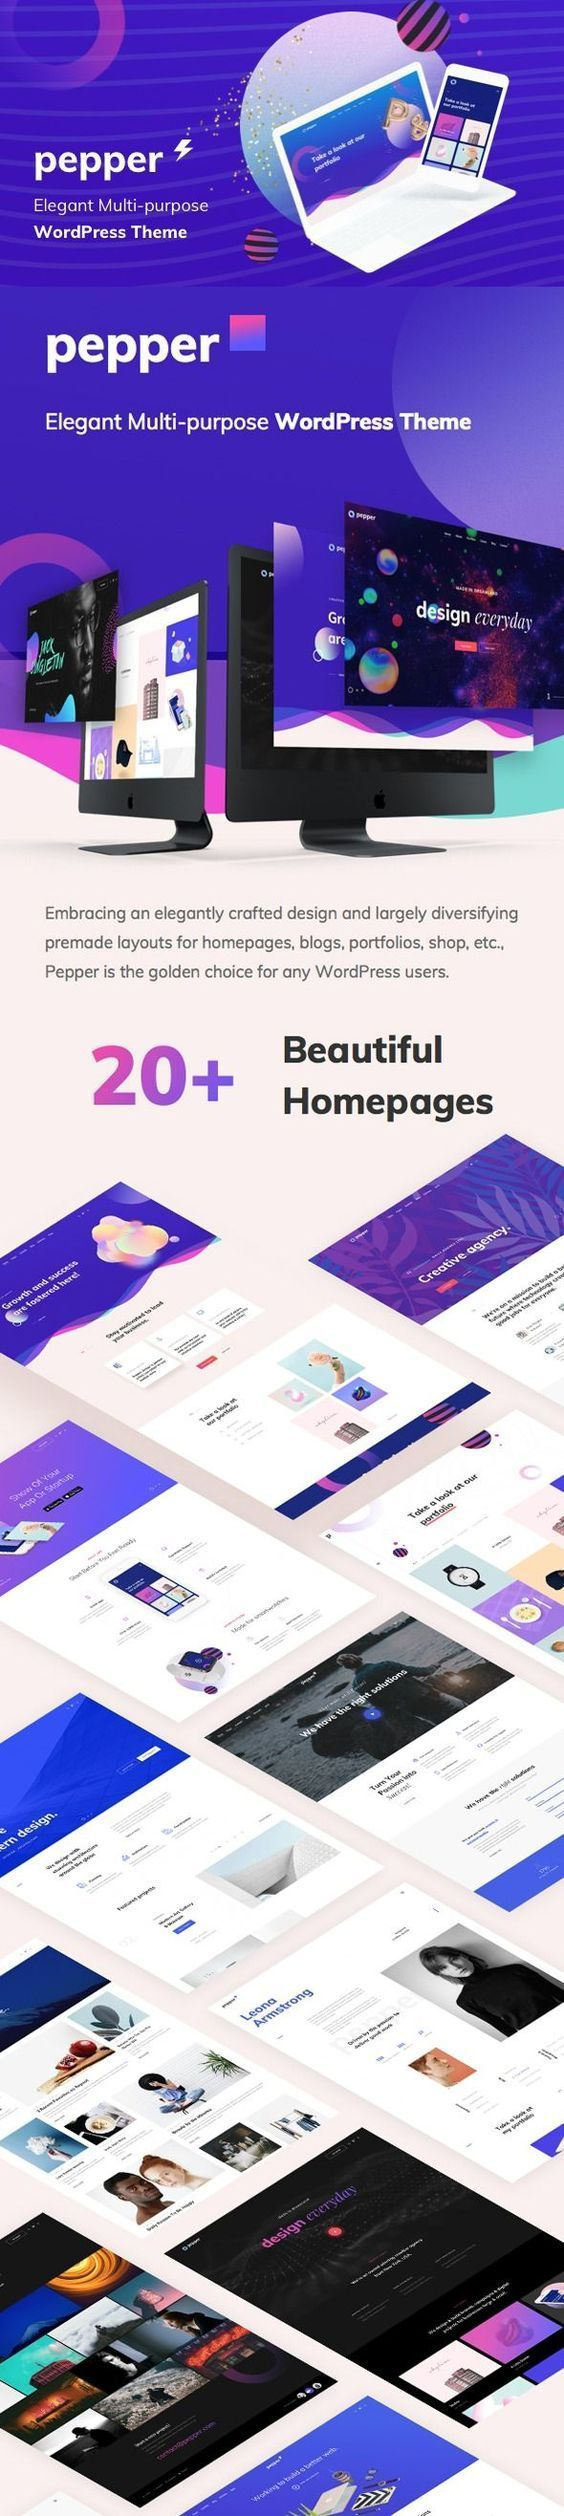 Puca v1.4.1 - Optimized Mobile WooCommerce WordPress Theme - [Nulled]